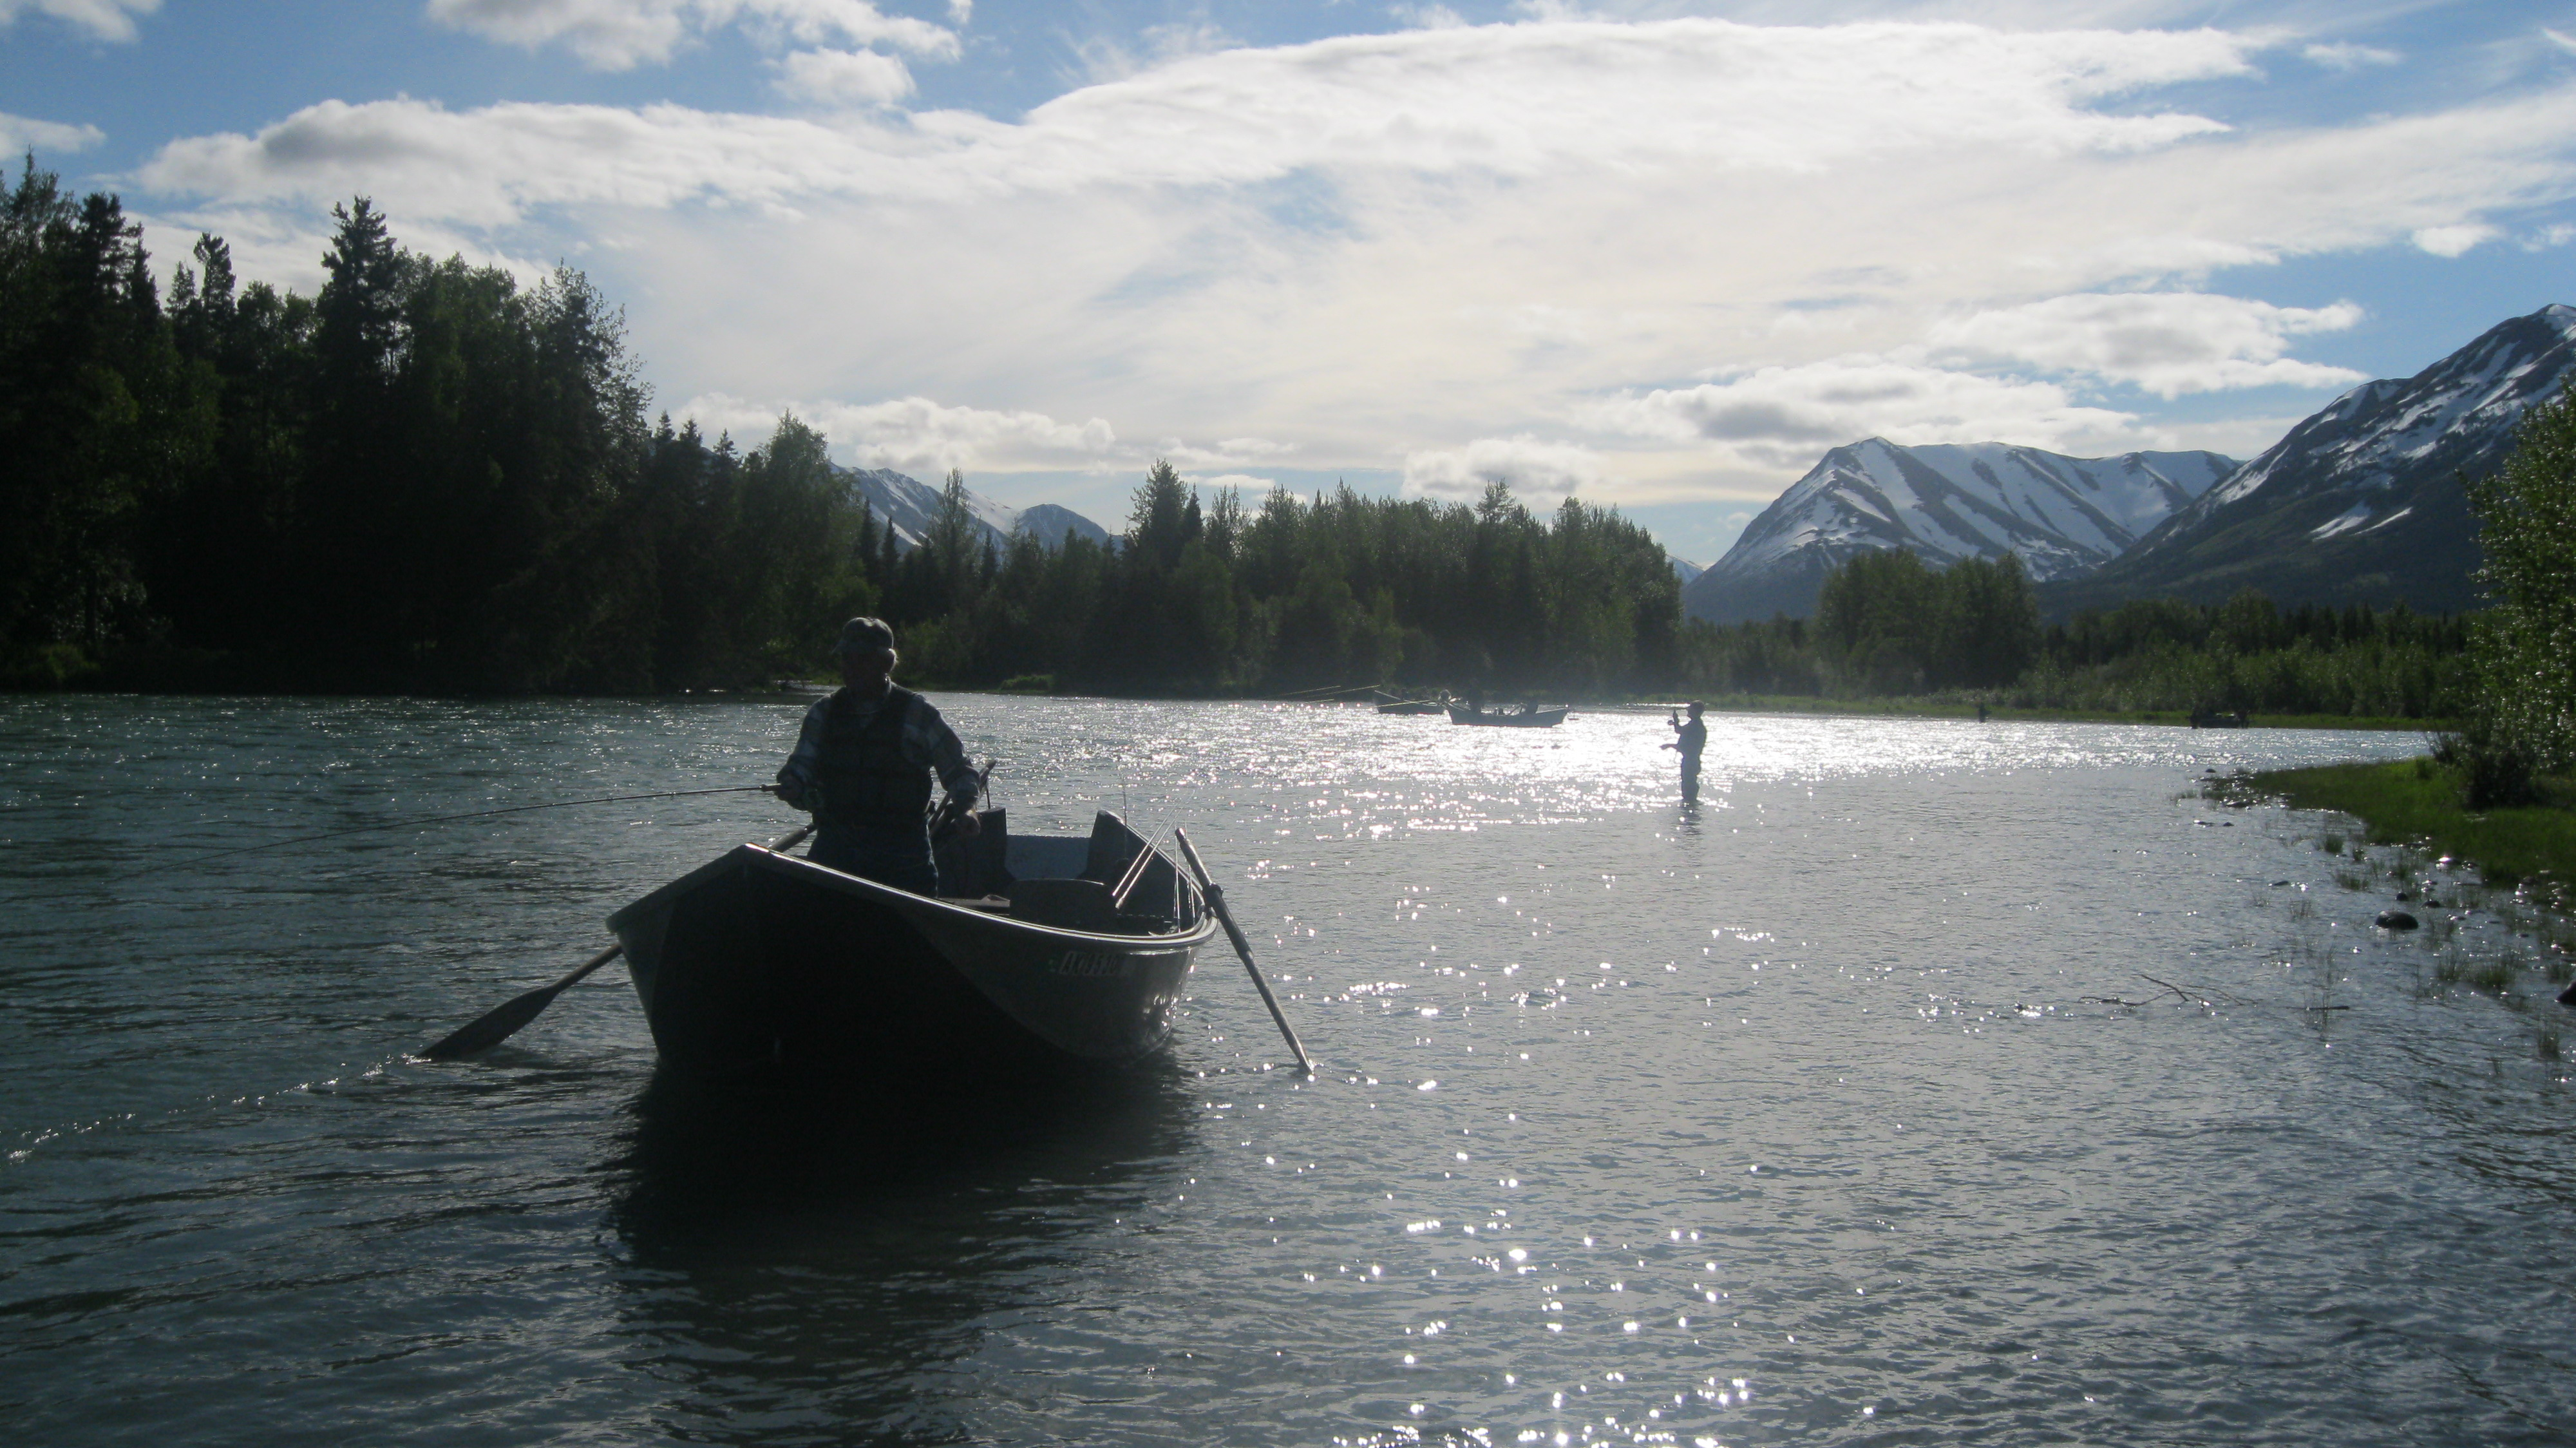 Kenai river fly fishing guided alaska fly fishing for Kenai river fishing